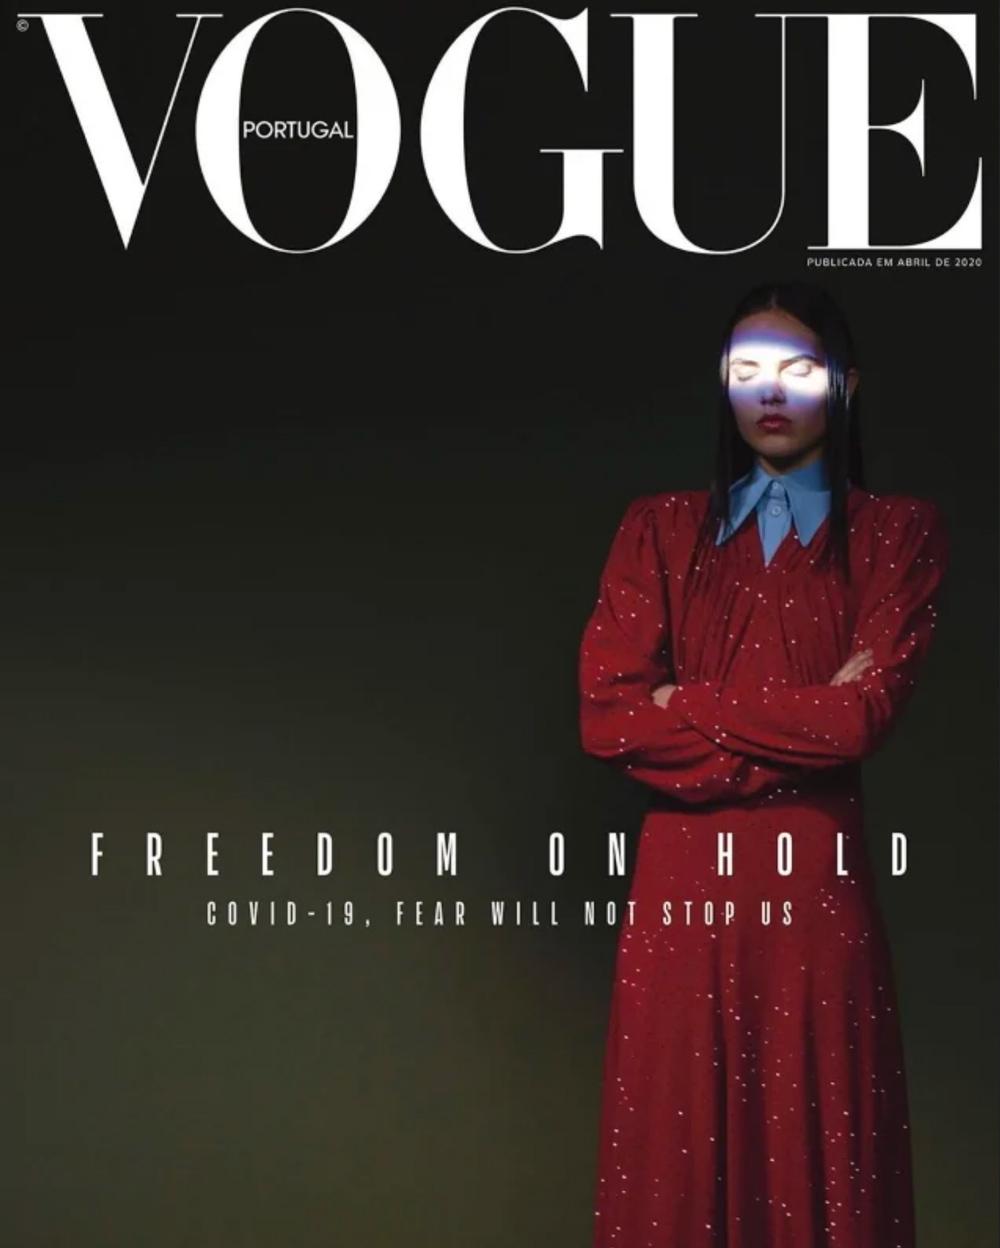 Vogue Portugal обложка за апрель 2020